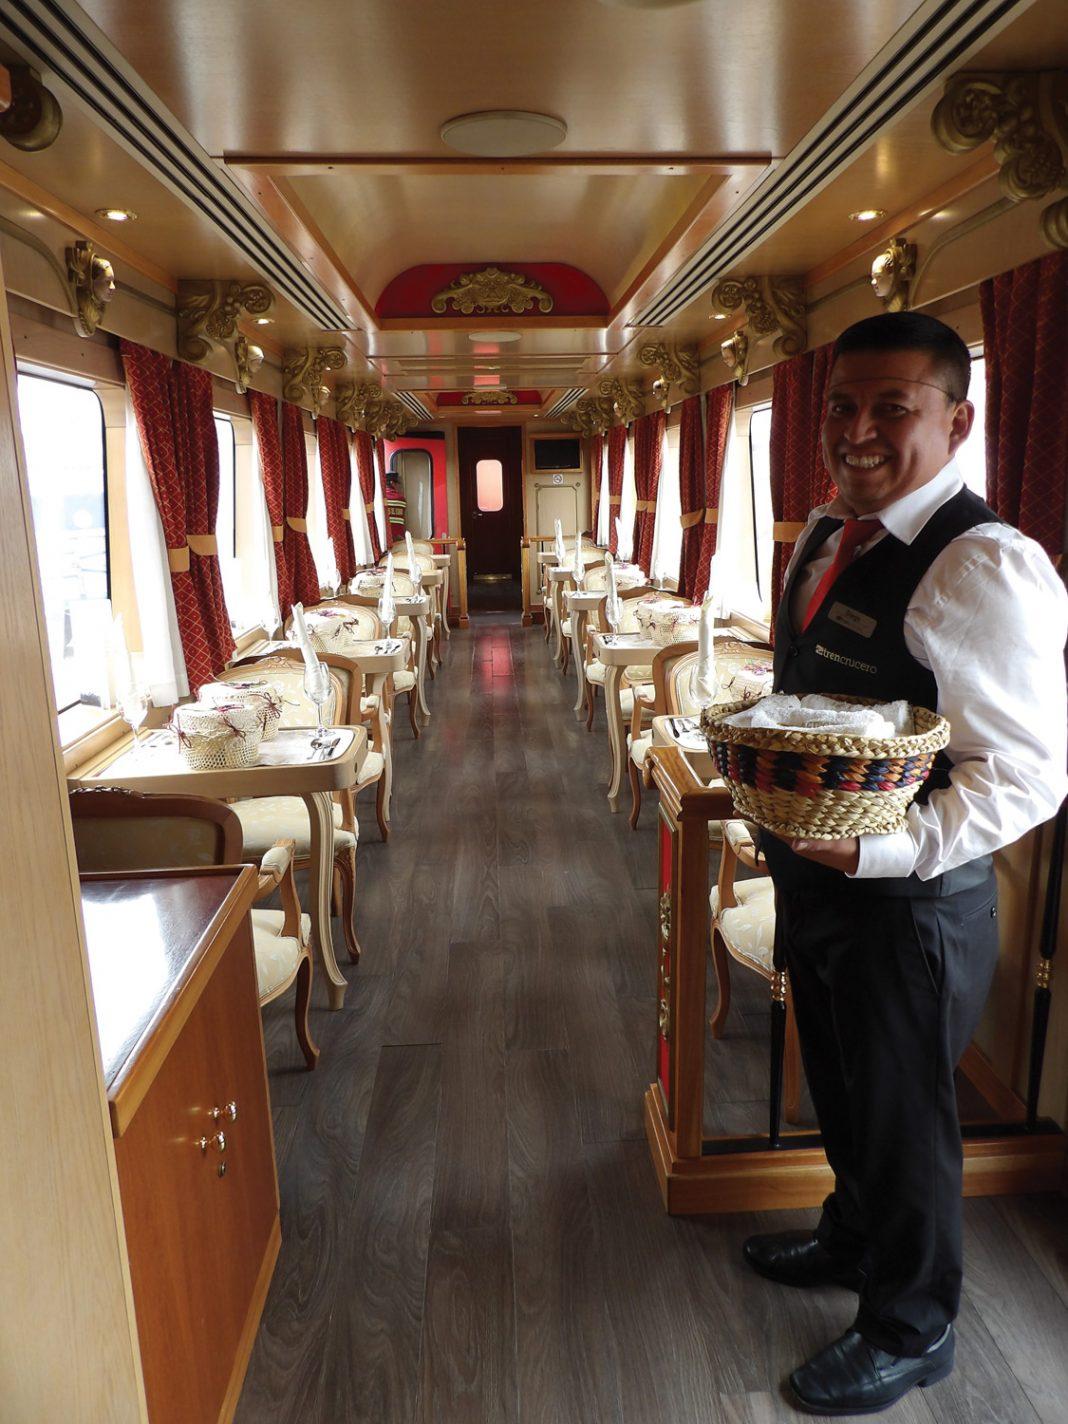 Dining car aboard the elegant Tren Crucero in Ecuador. (Carla Hunt)